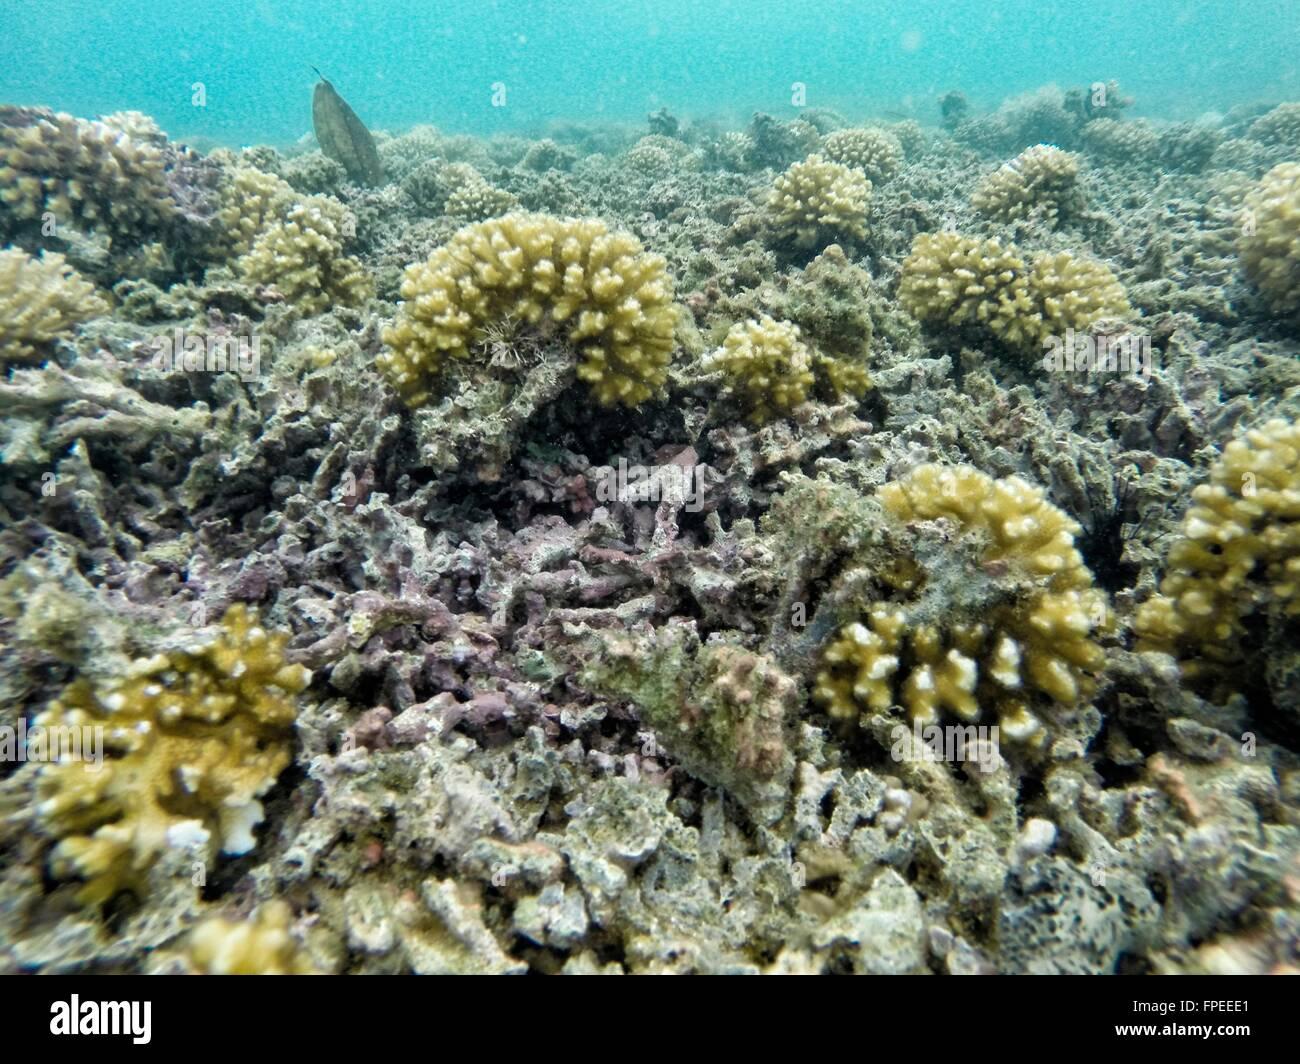 Ungesunde Korallenriff mit mehreren harte Korallen gebrochen Stockbild